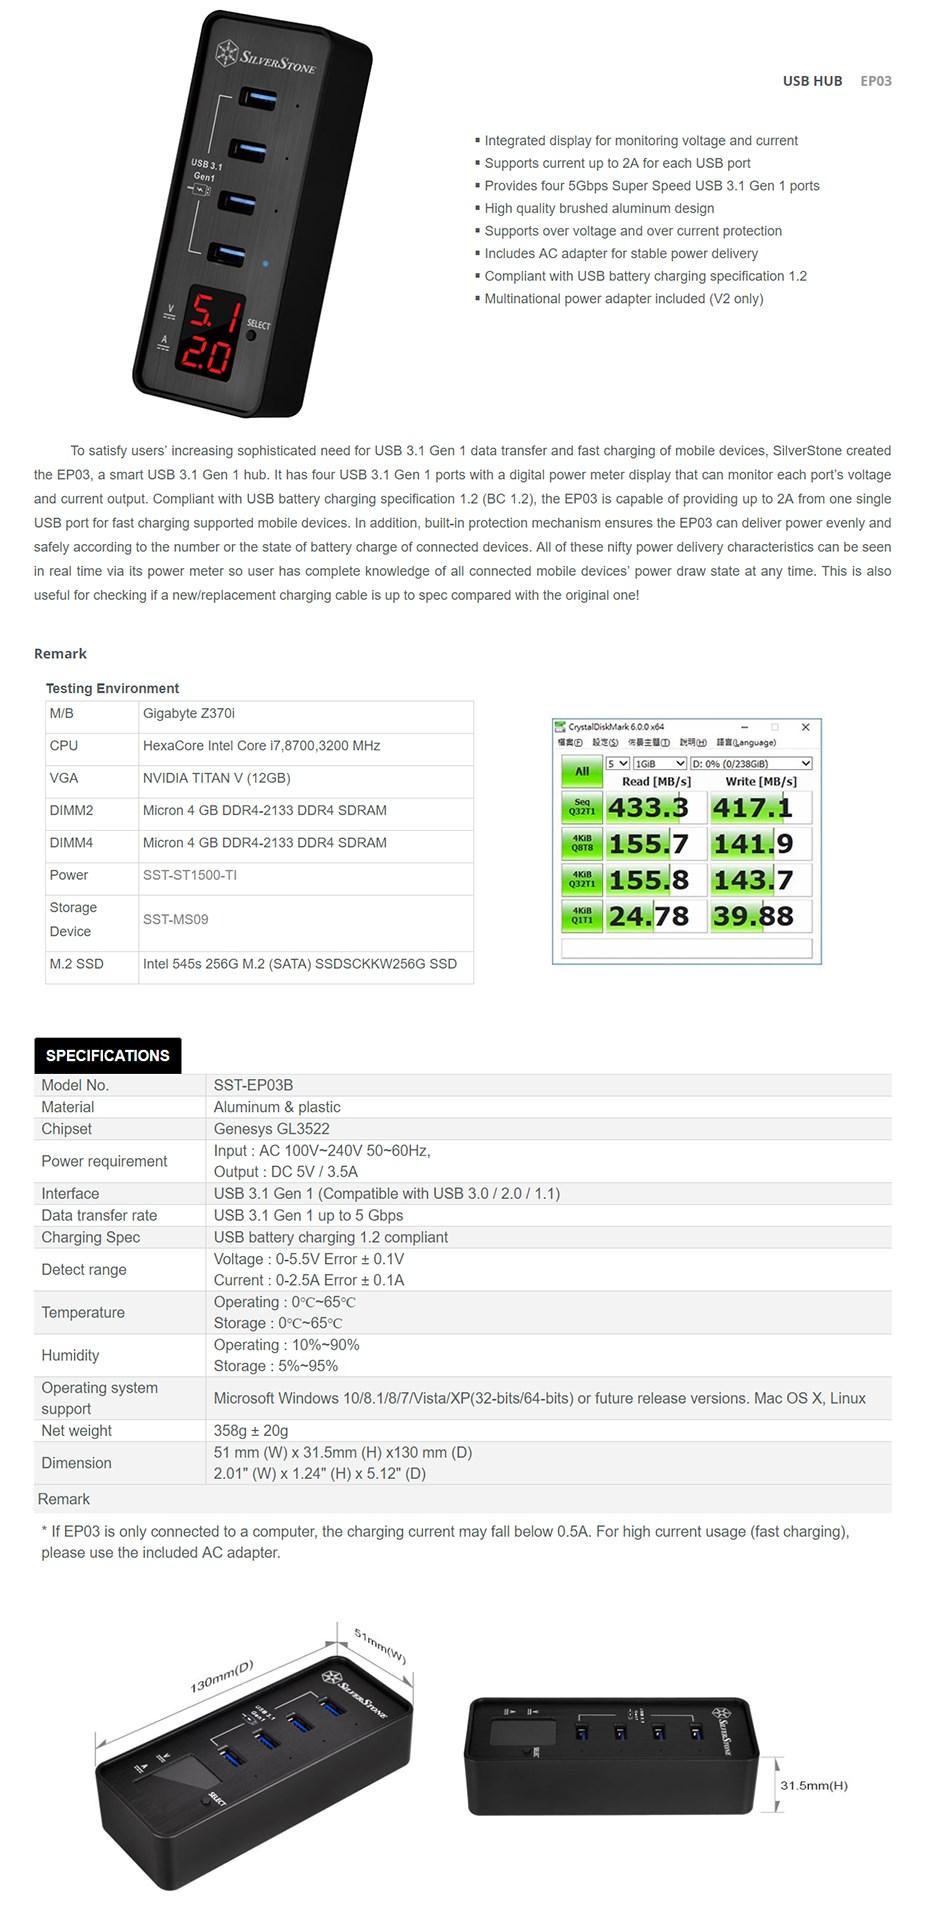 SilverStone EP03 USB 3.1 Gen1 USB Hub - Desktop